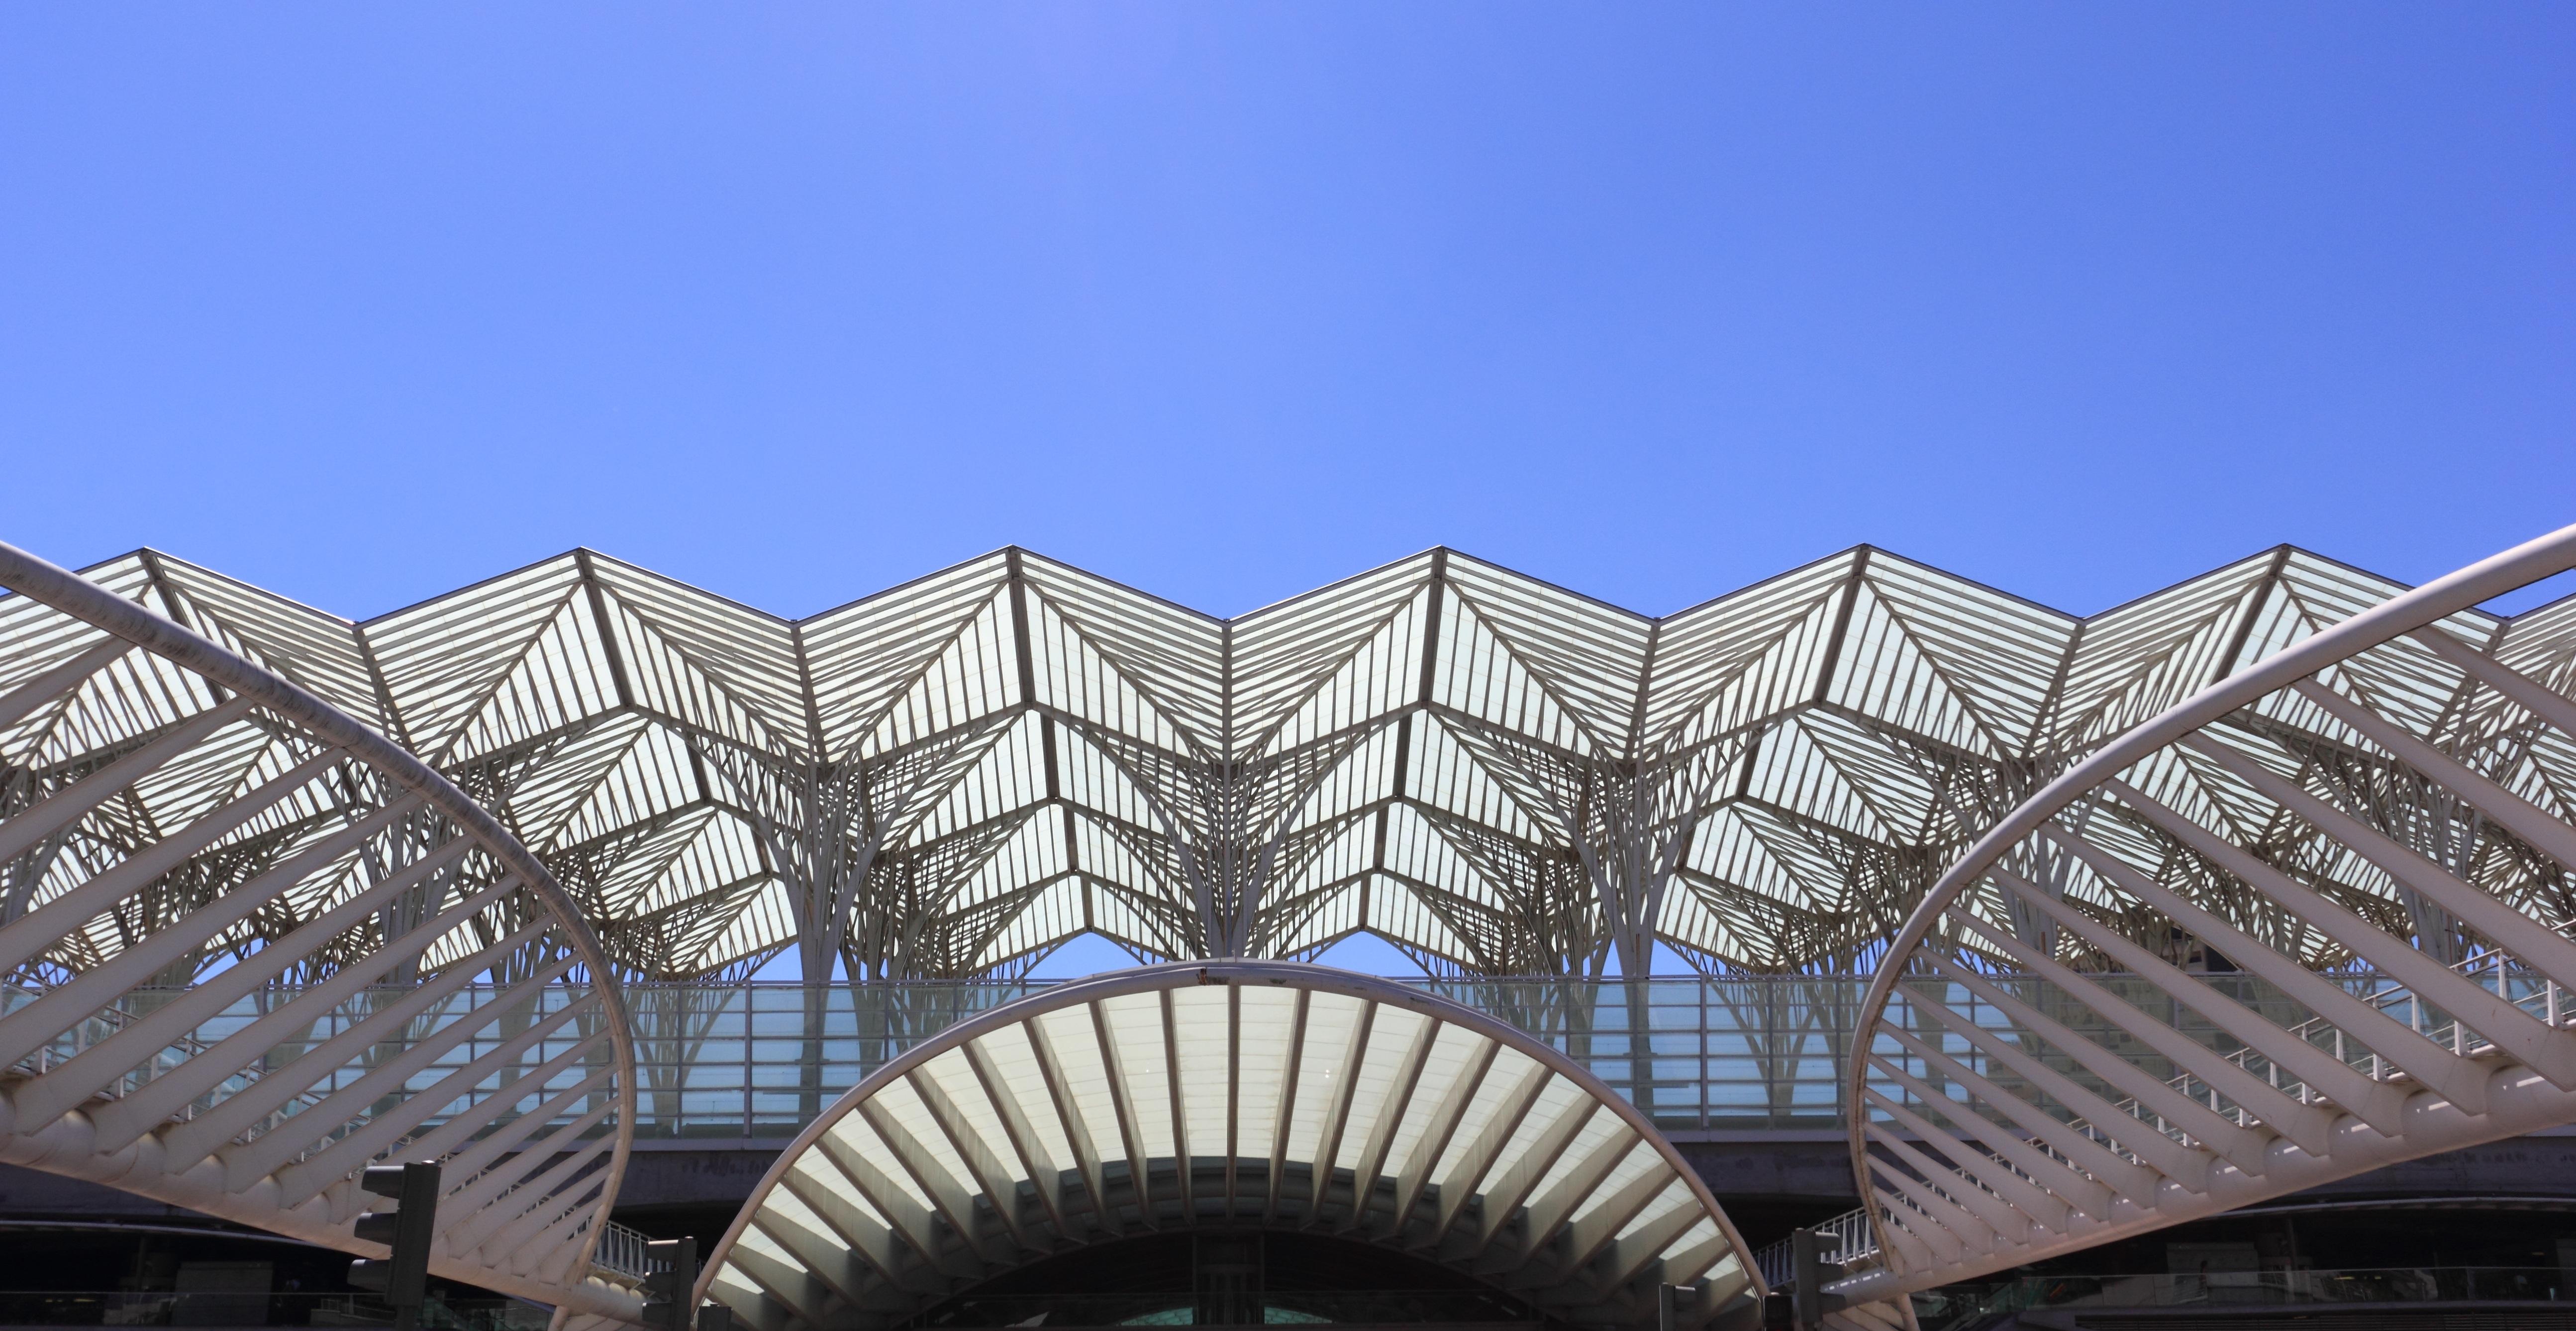 Free Images Architecture Roof Entrance Landmark